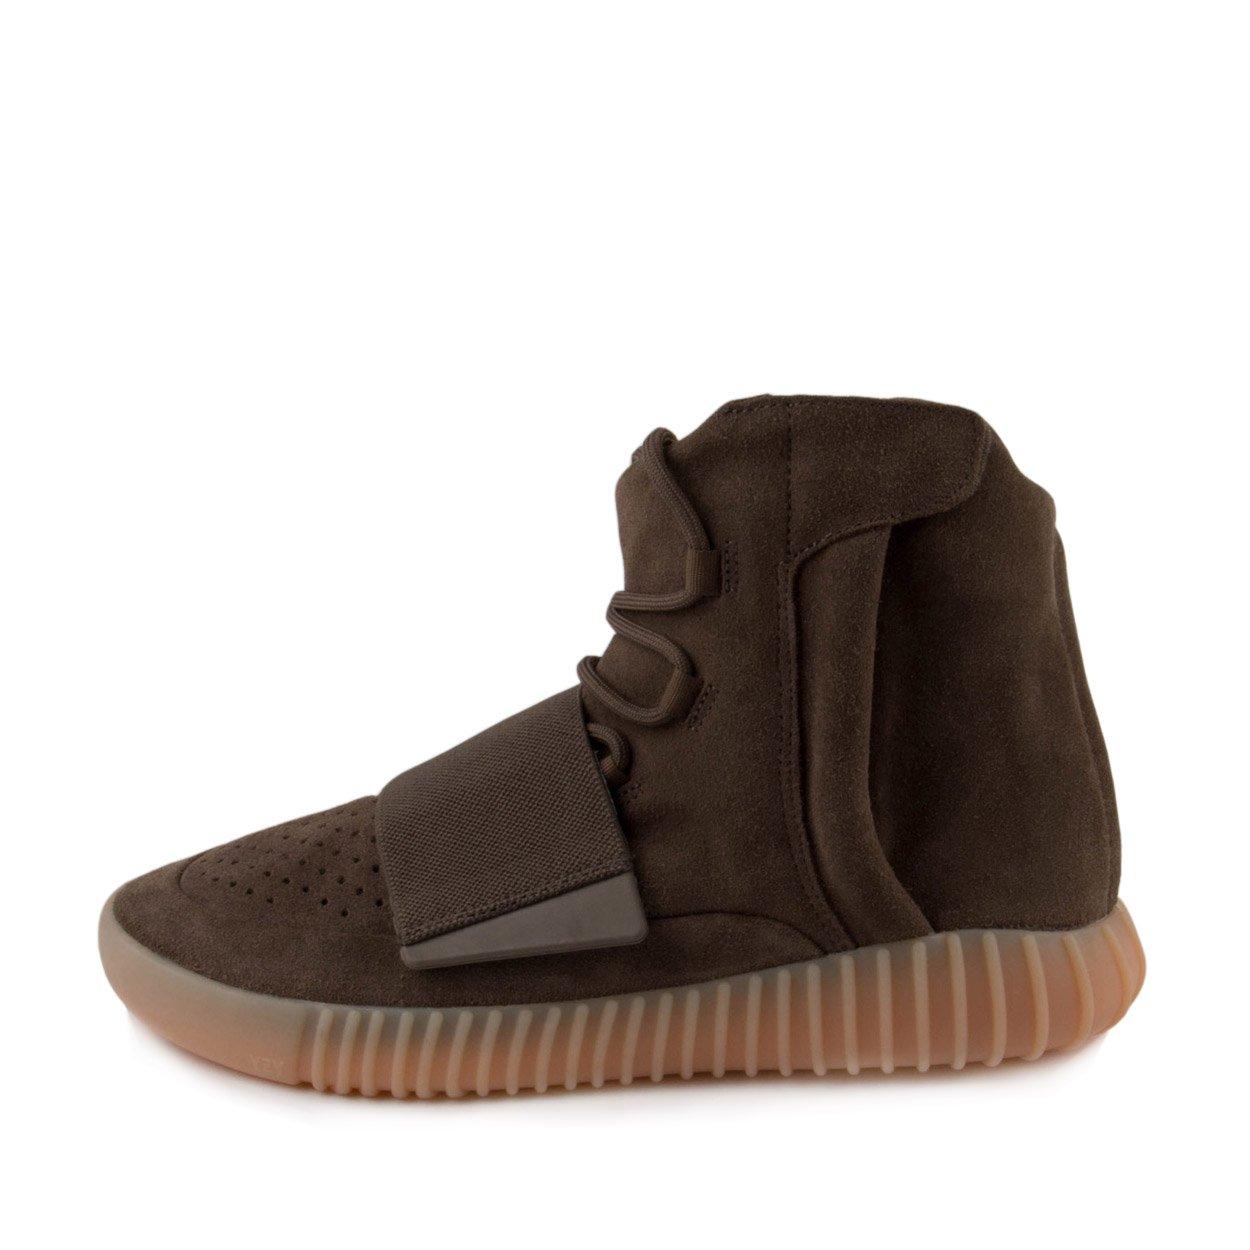 Adidas Mens Yeezy Boost 750 KANYE WEST Chocolate BrownGum